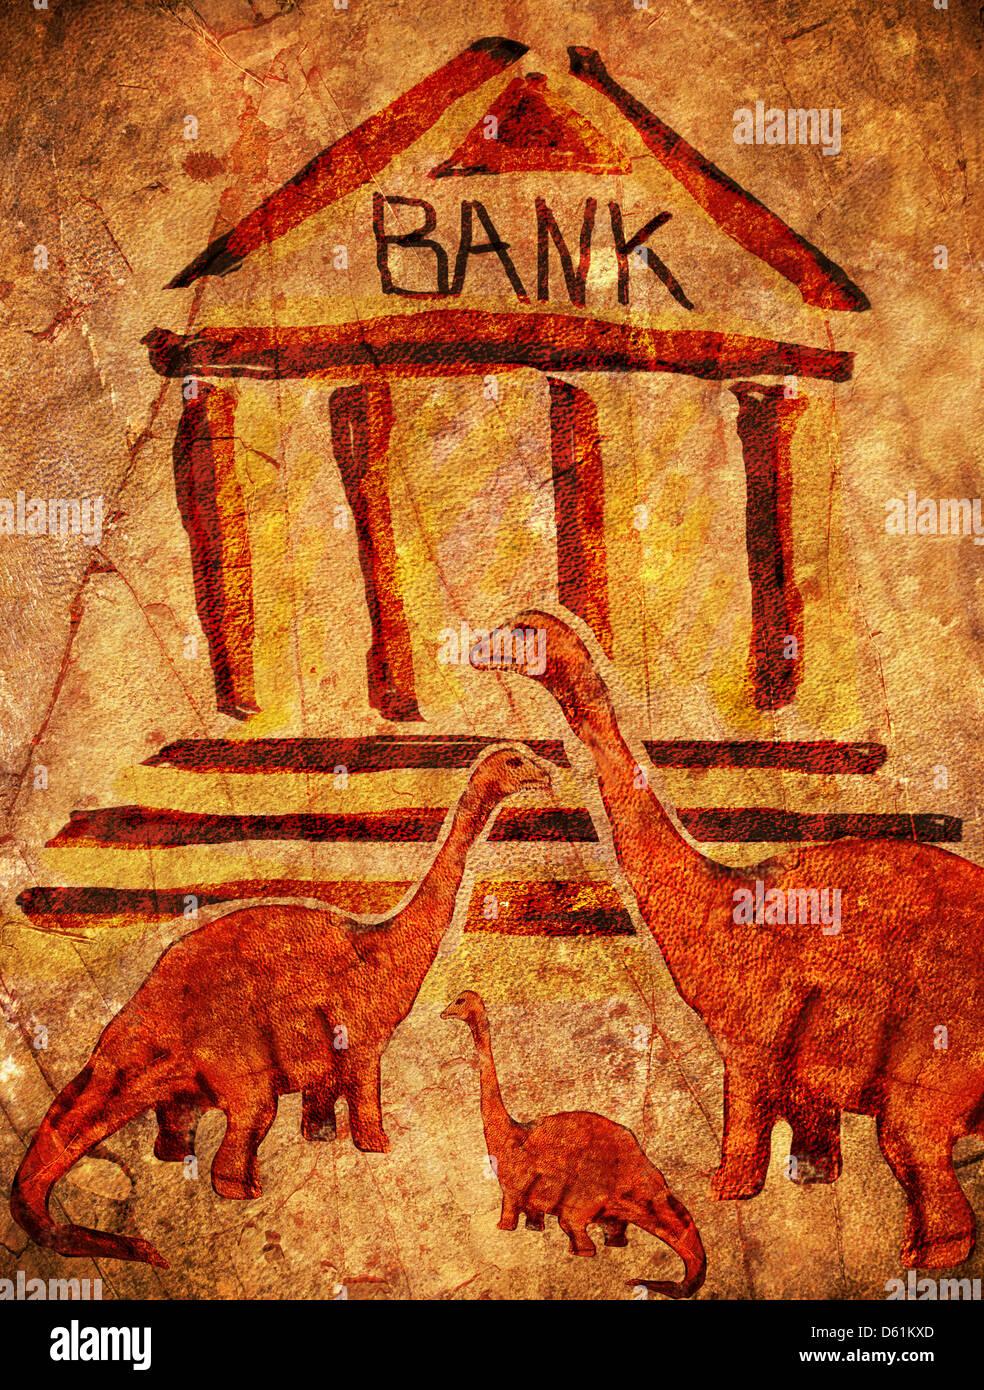 prehistoric bank with dinosaurs digital illustration - Stock Image